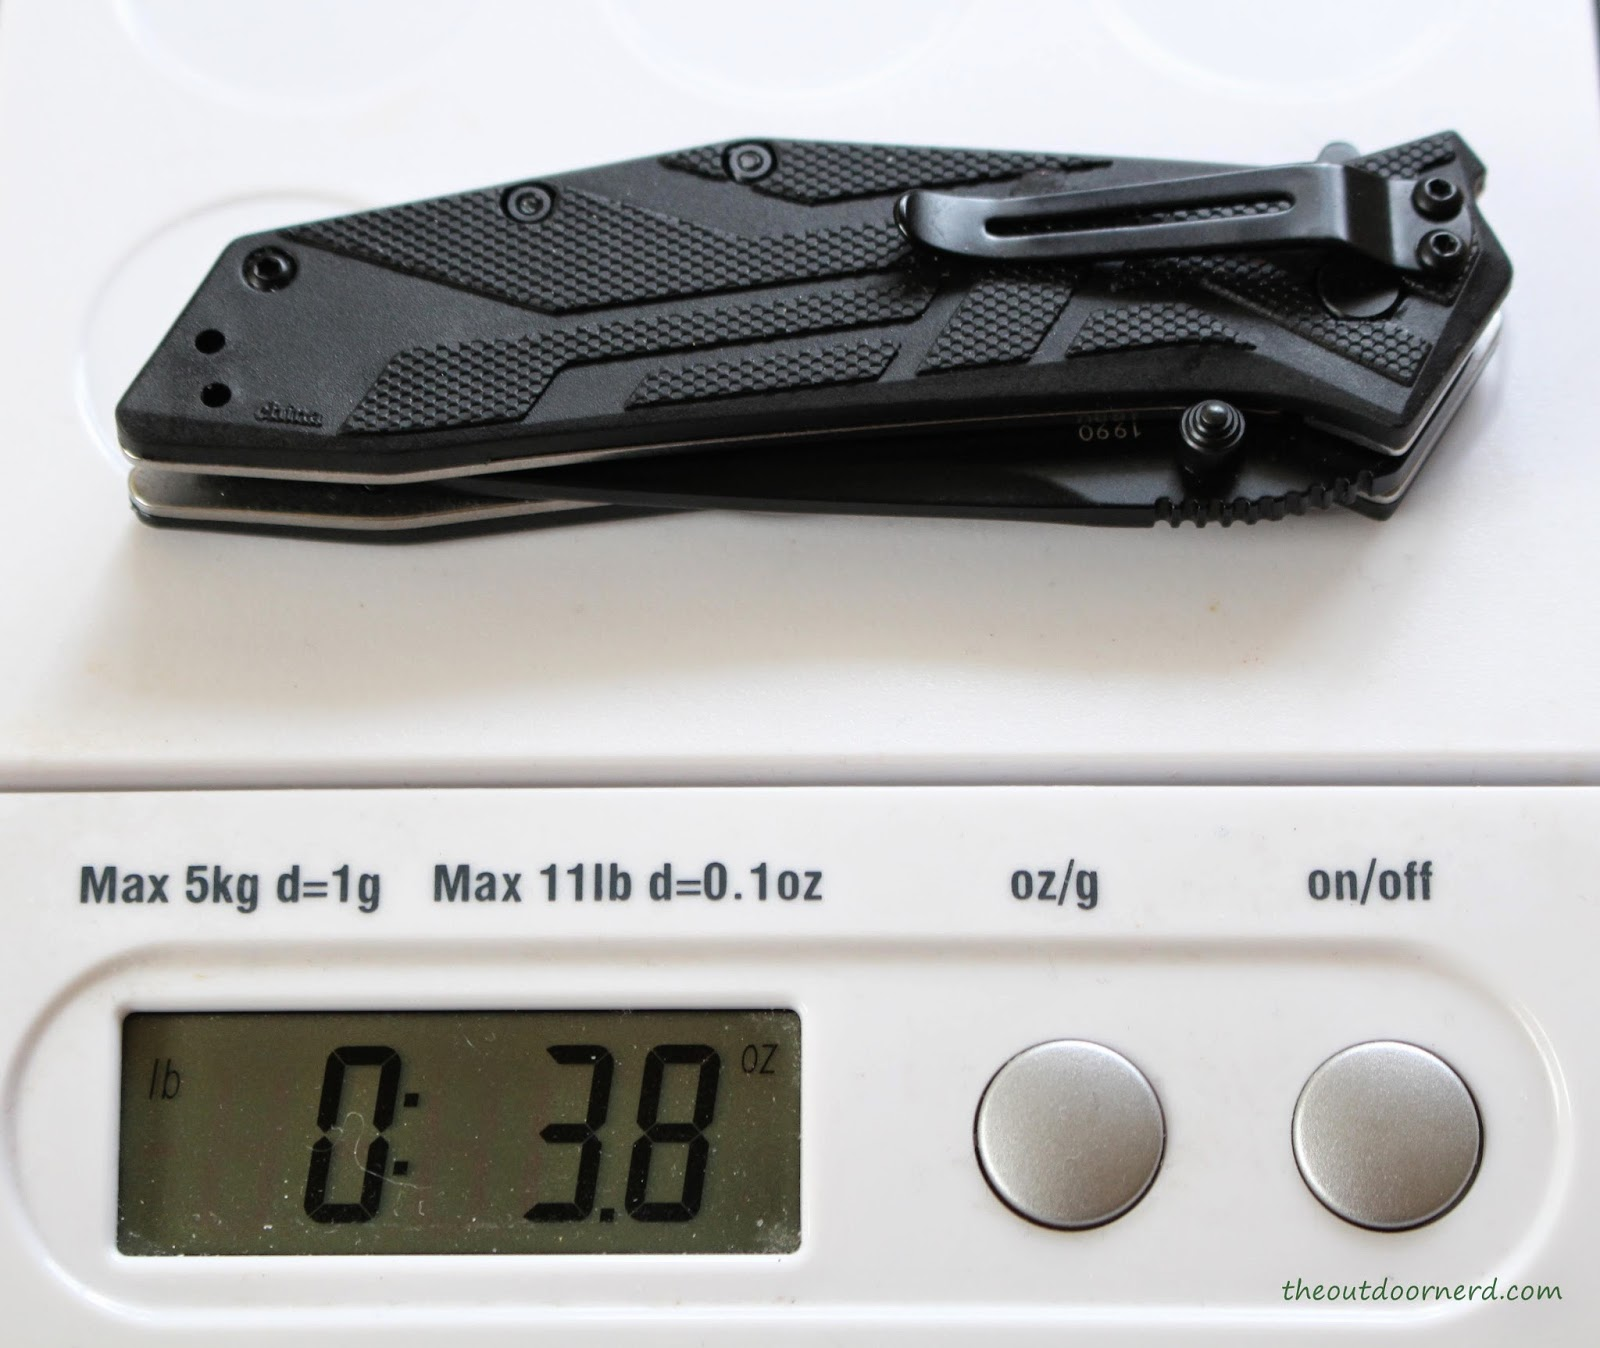 Kershaw Brawler Pocket Knife On Scale